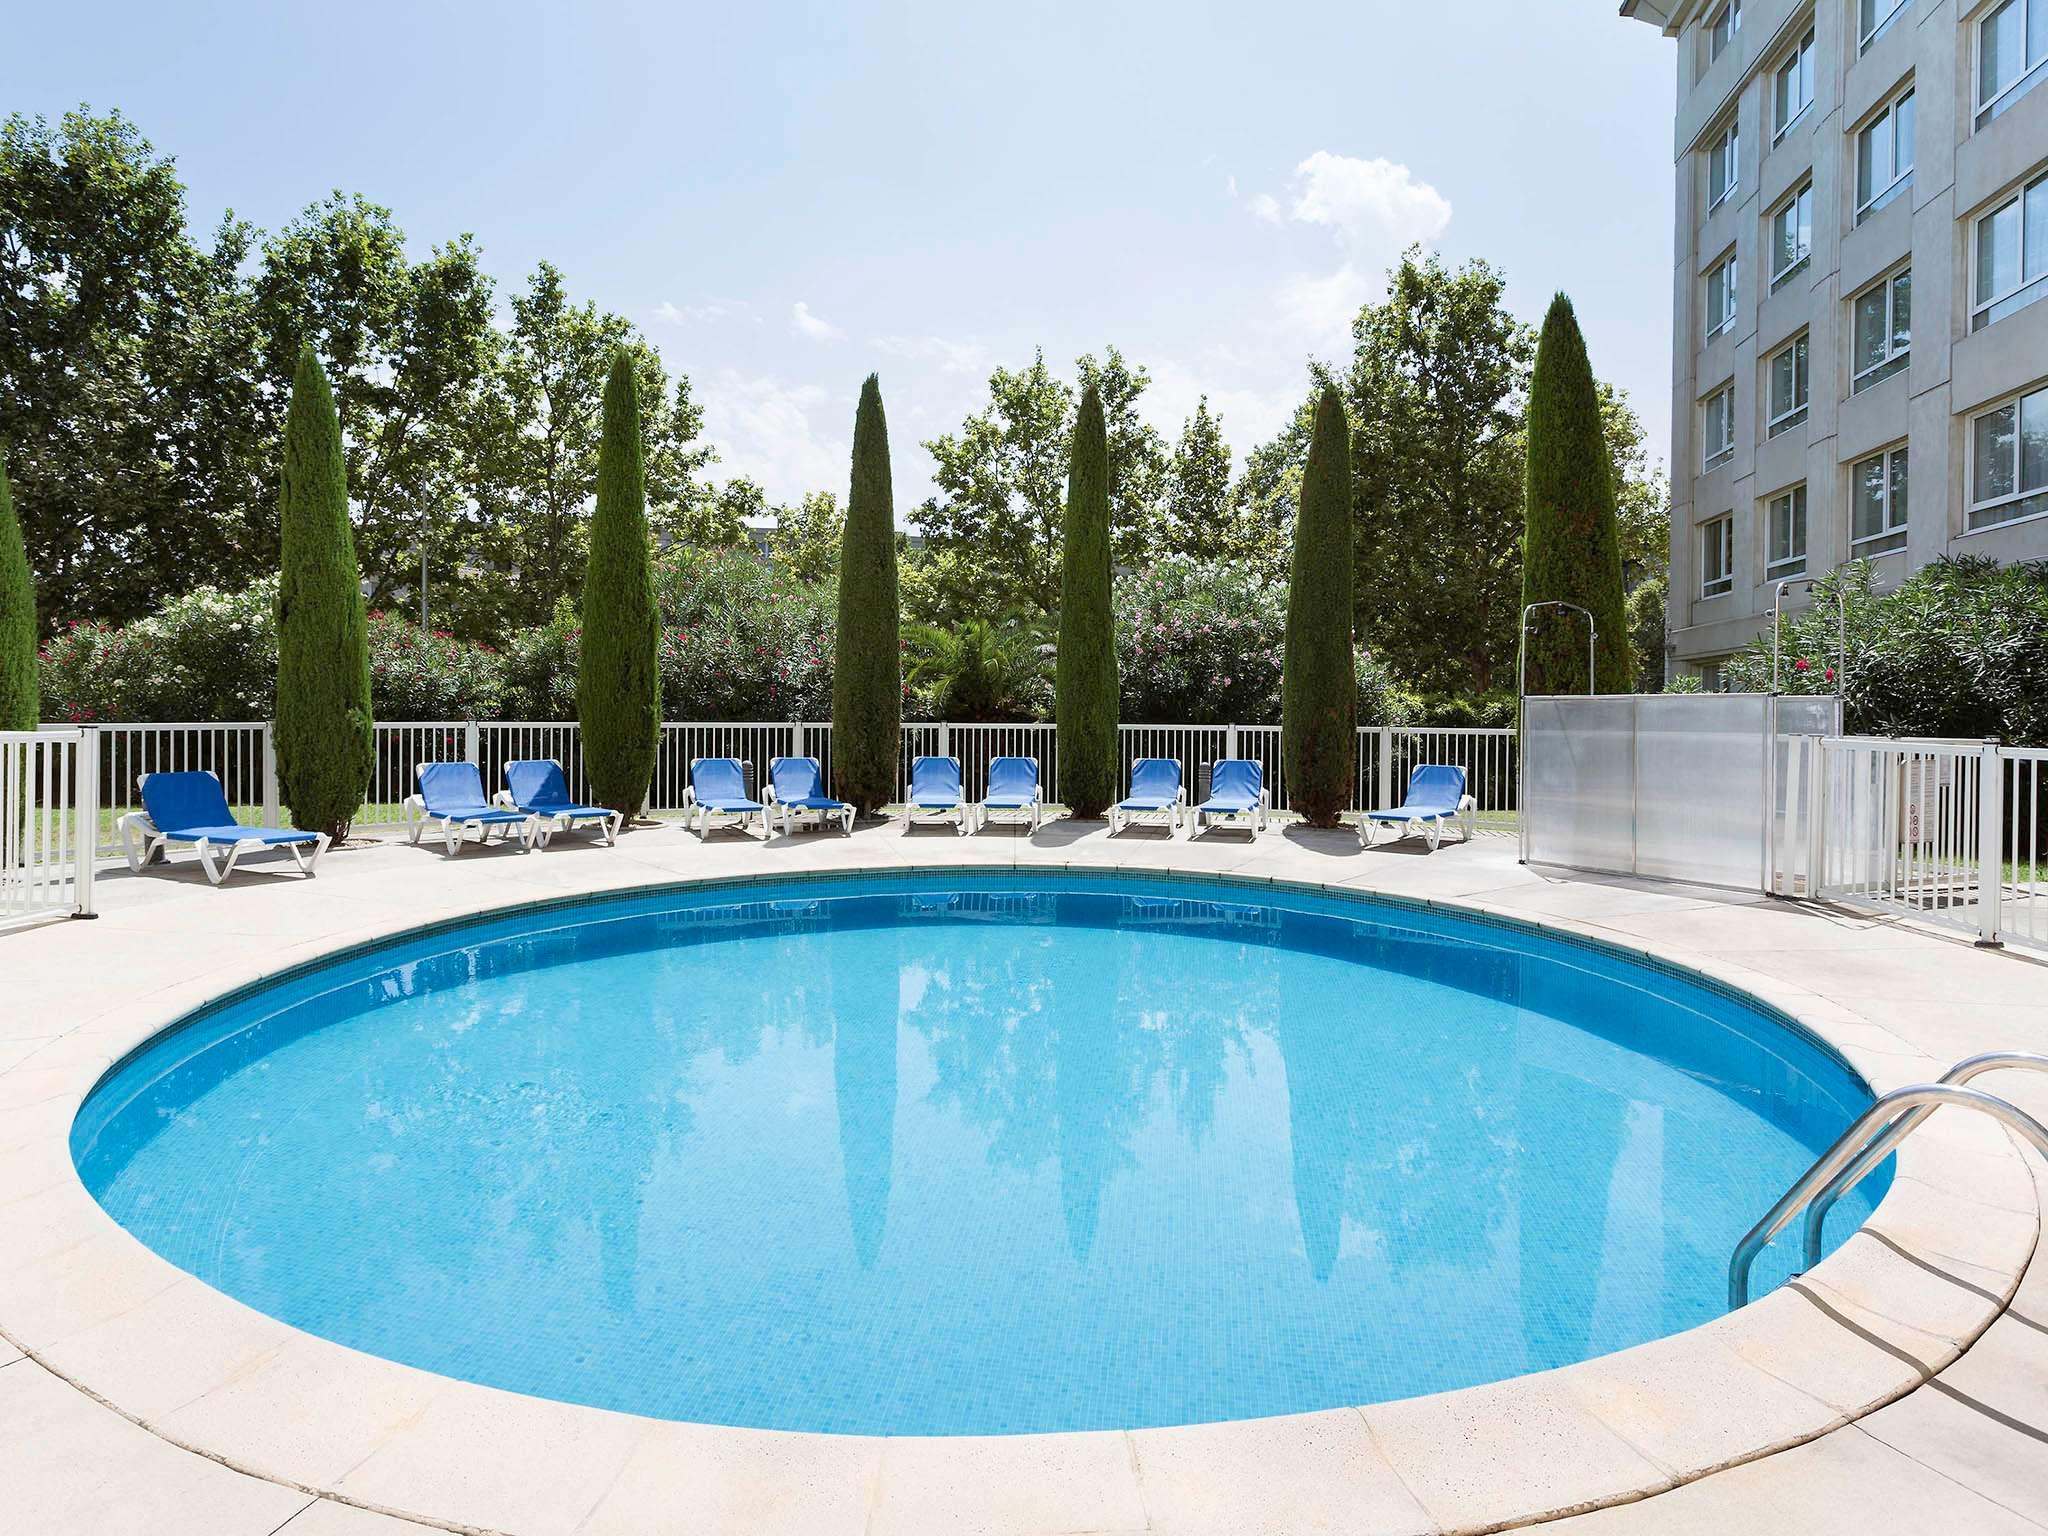 Hotel - Novotel Suites Montpellier